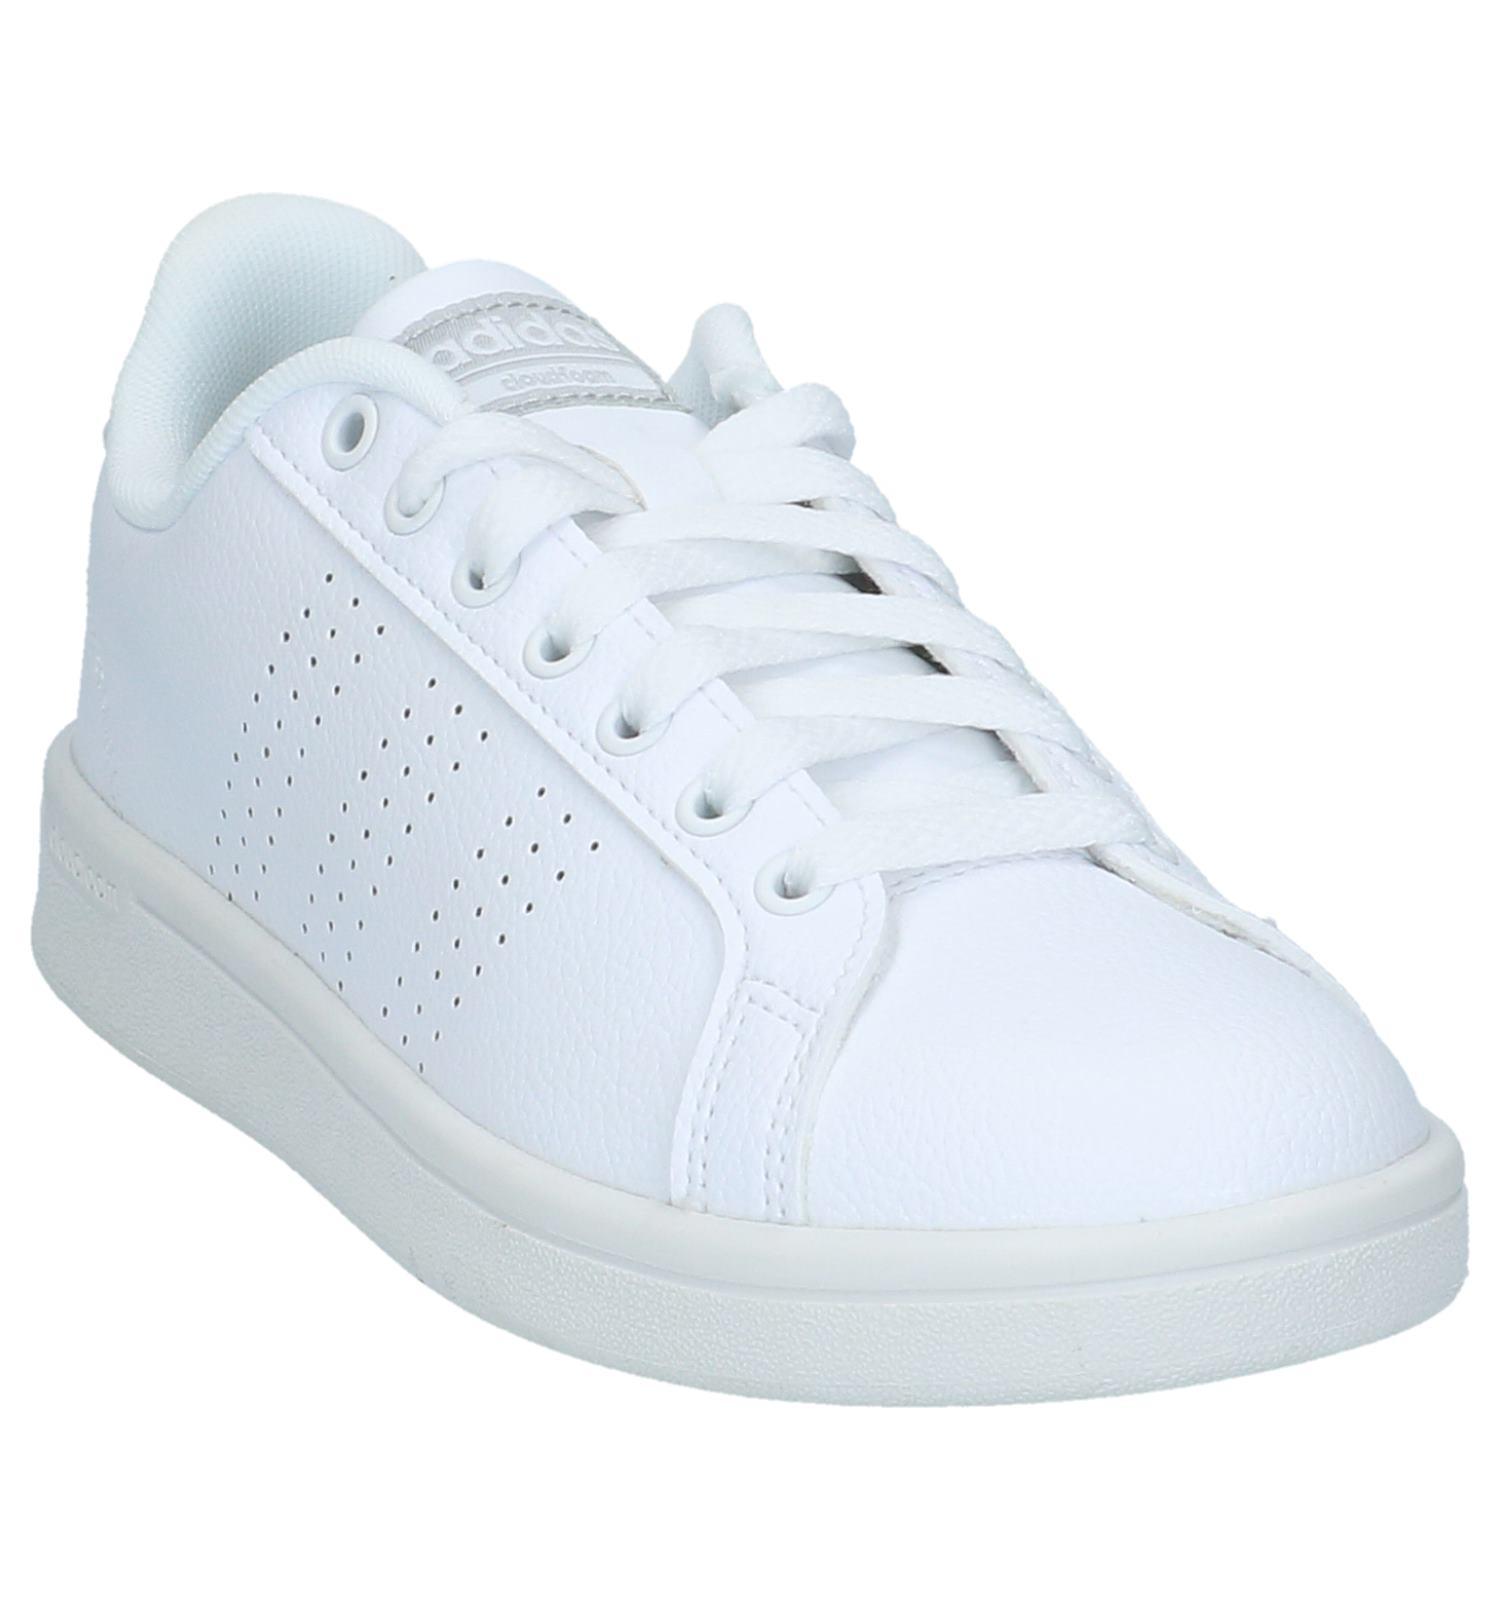 Witte Sneakers adidas Advantage CF | TORFS.BE | Gratis ...